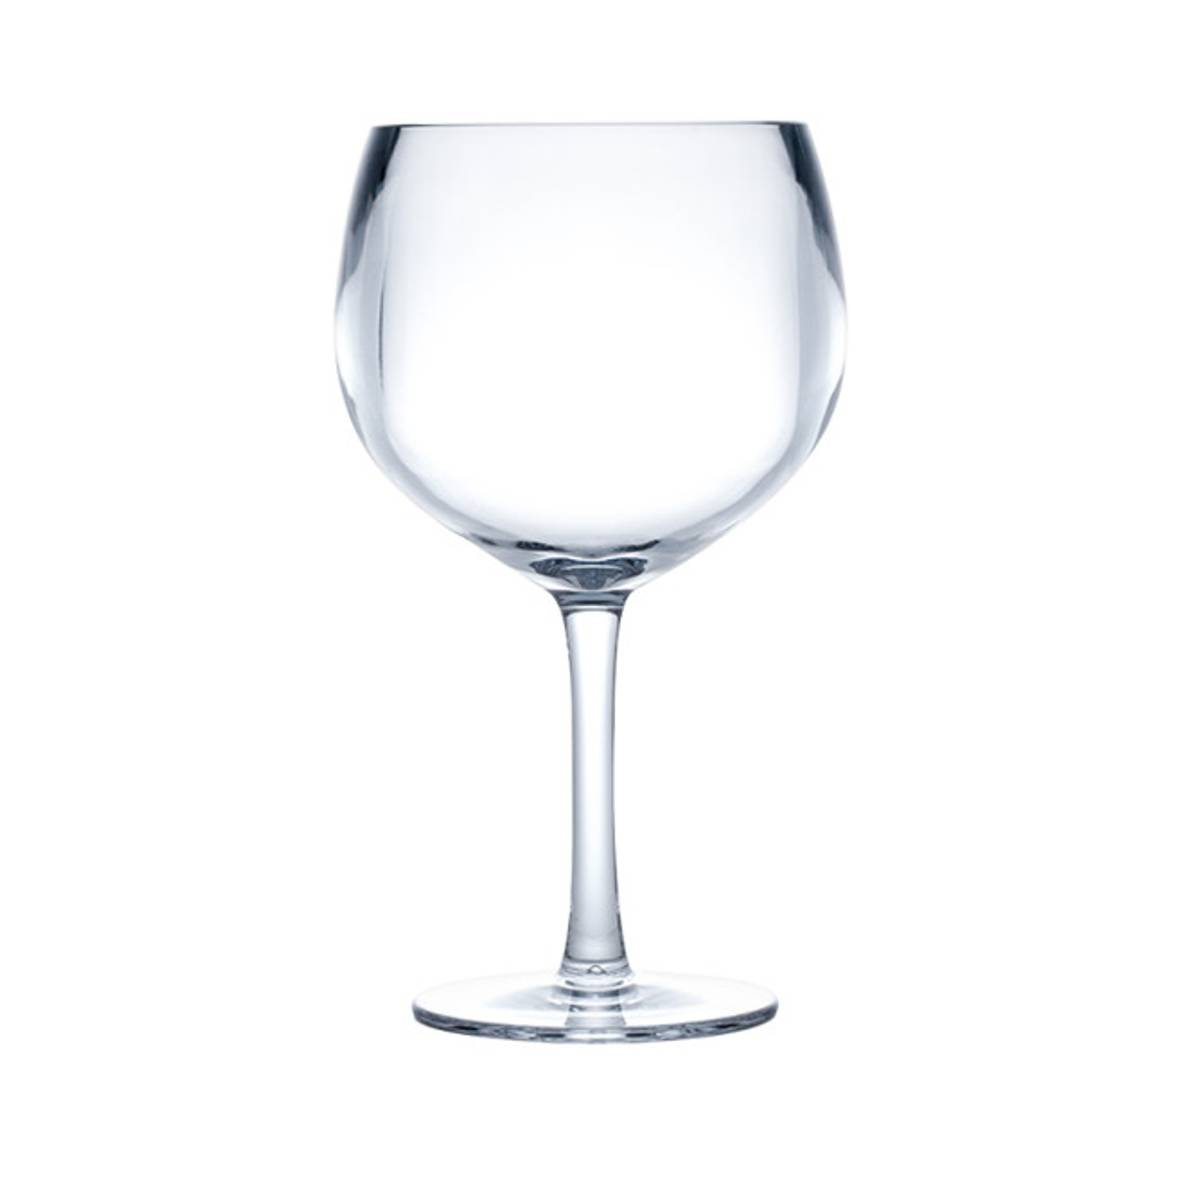 Strahl Aperol / Gin glass 525ml